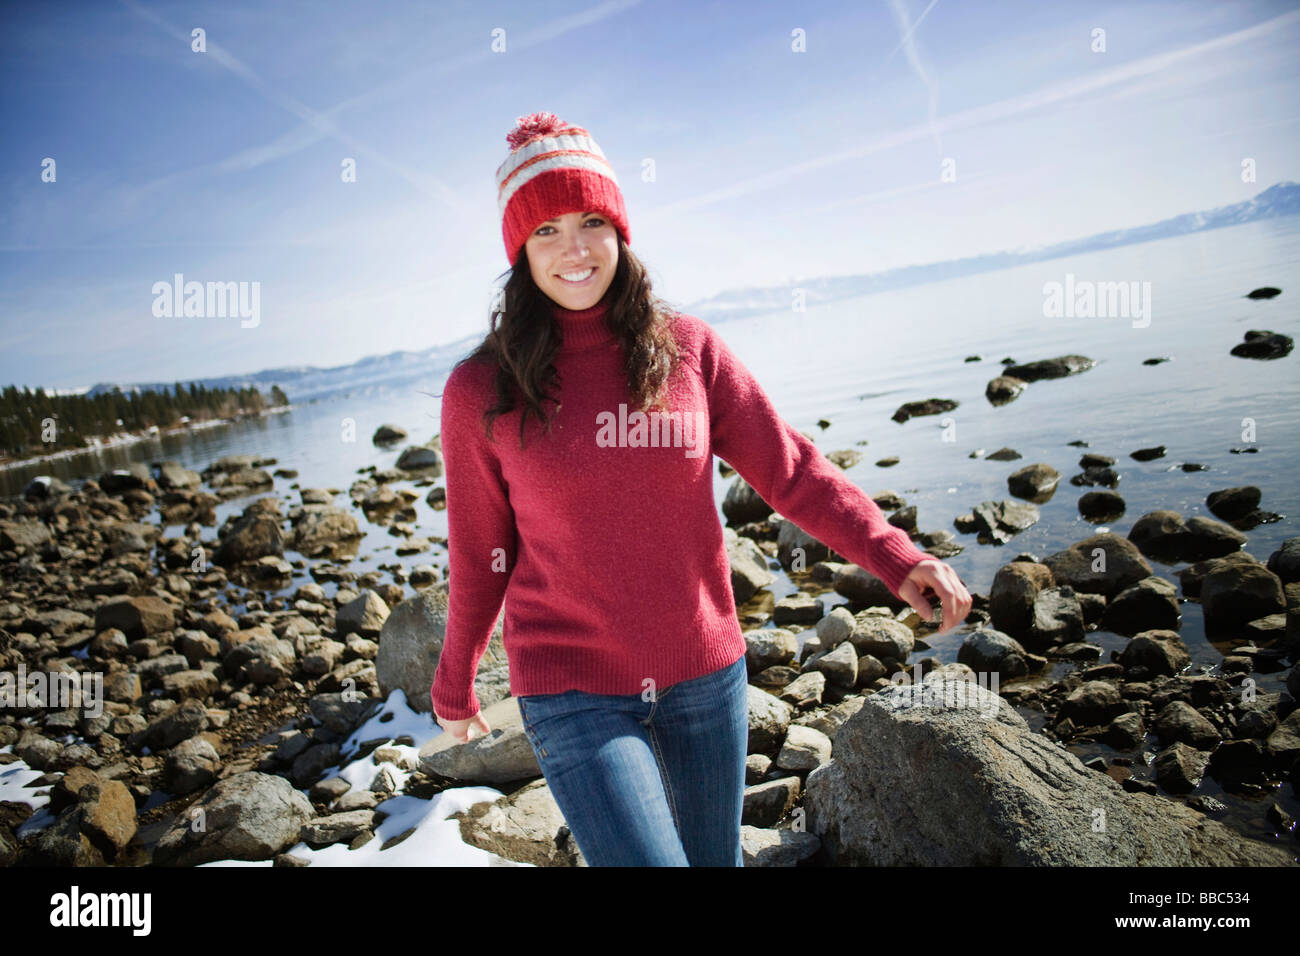 Woman walking on rocks near snowy lake - Stock Image